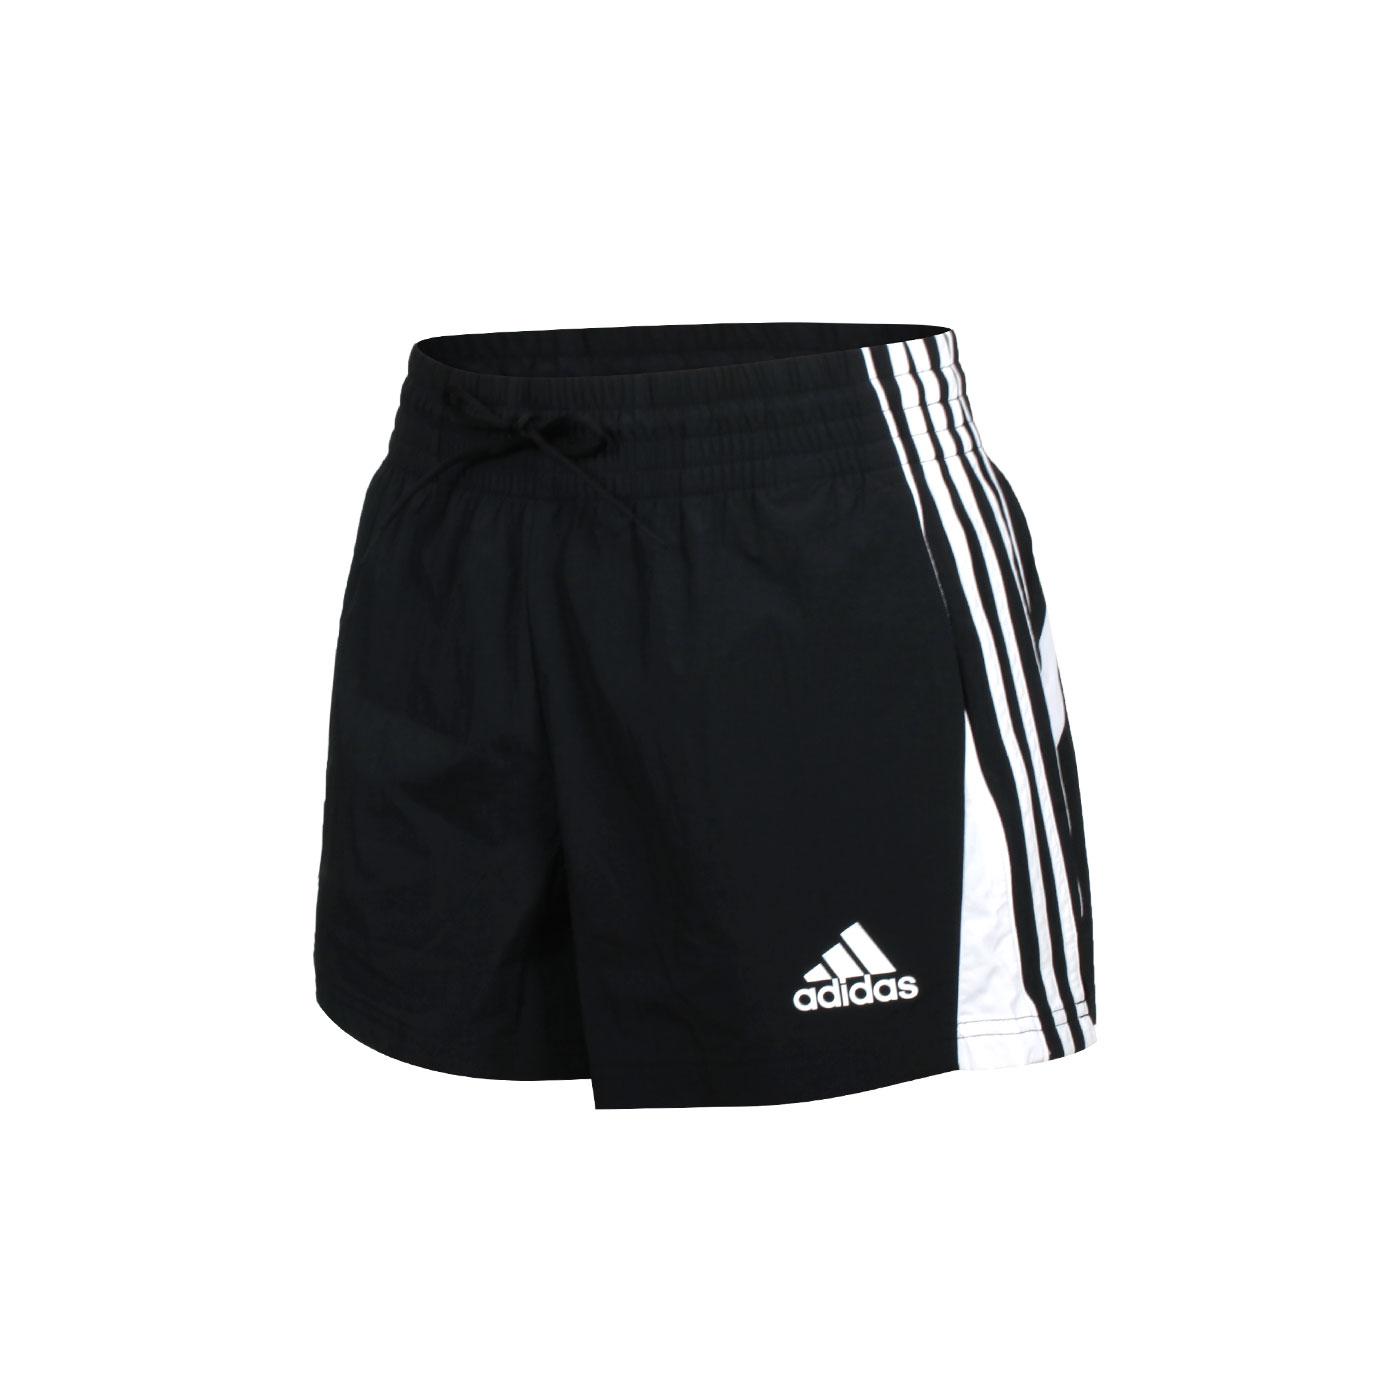 ADIDAS 女款運動短褲 FS6154 - 黑白